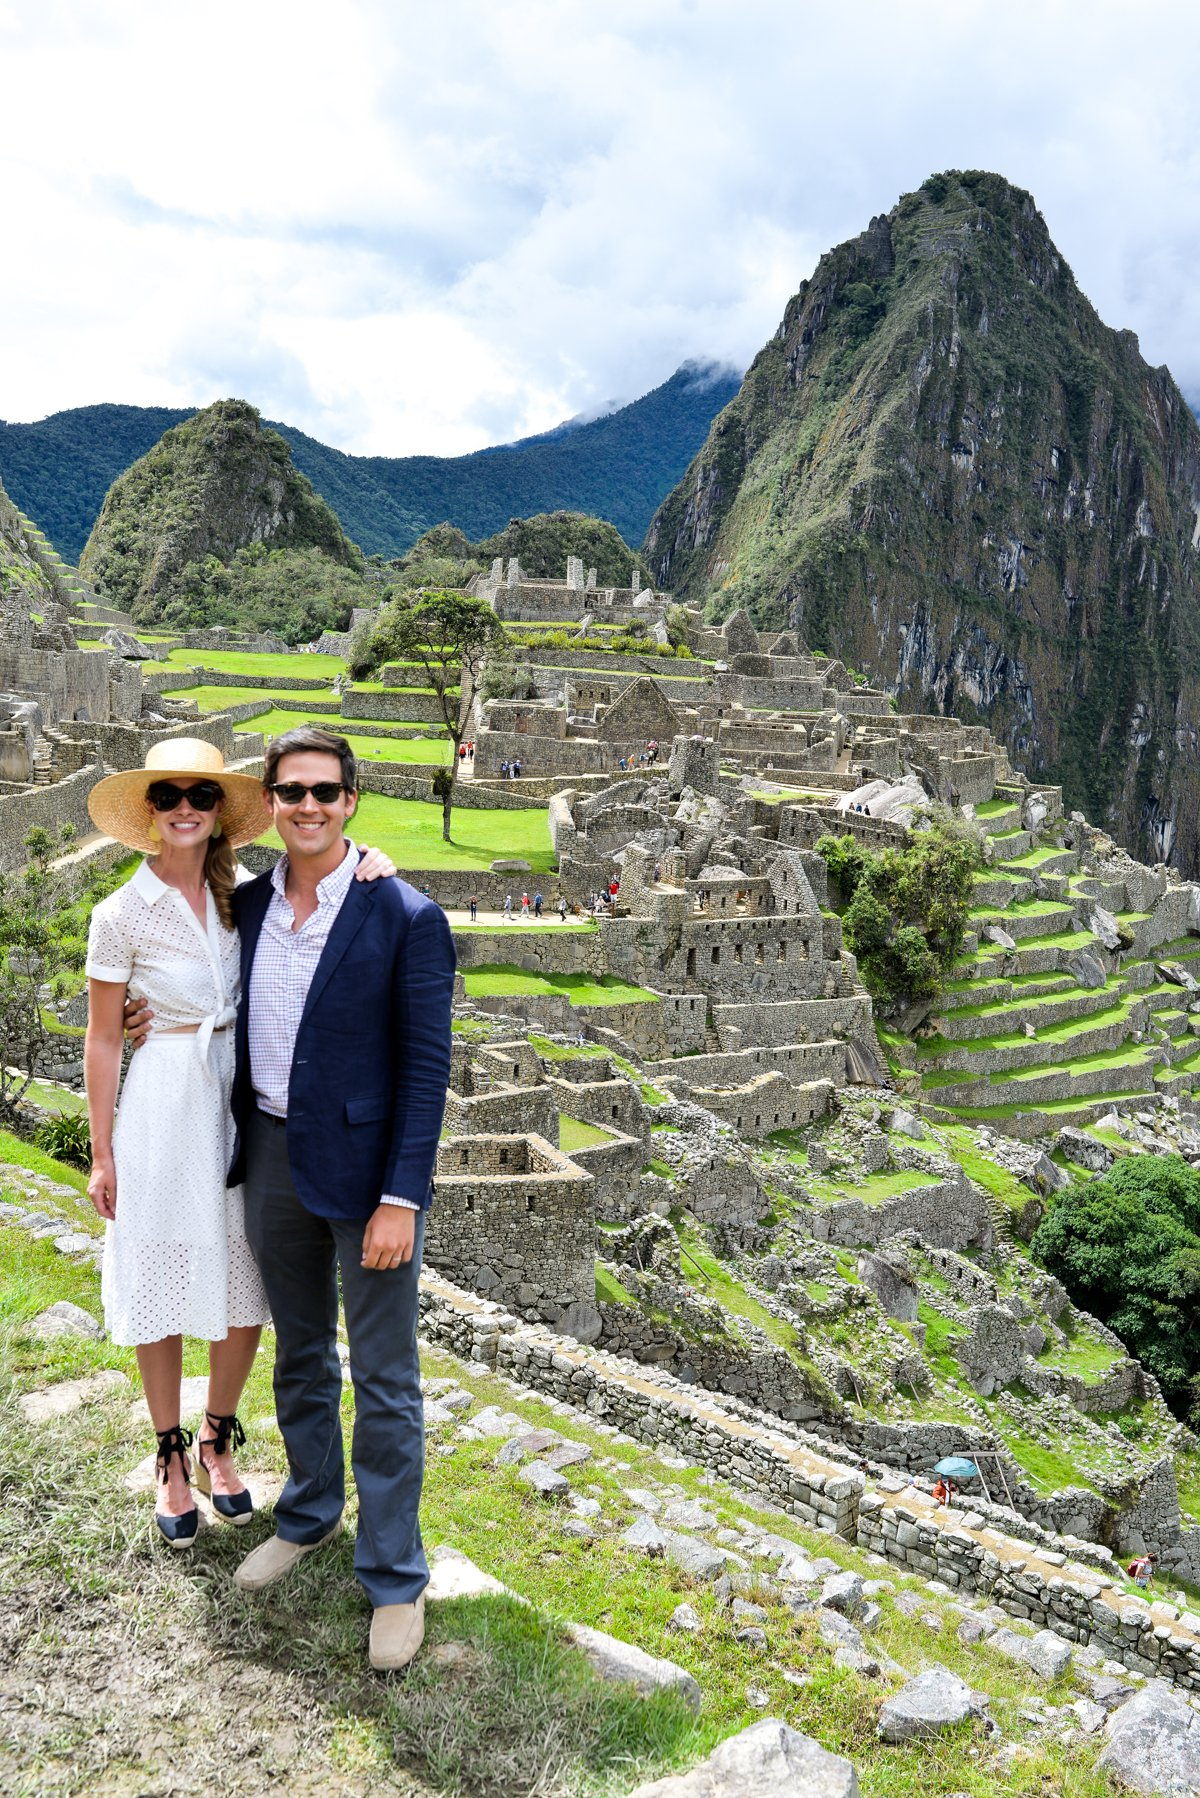 Stacie Flinner x Belmond Machu Picchu Peru-2